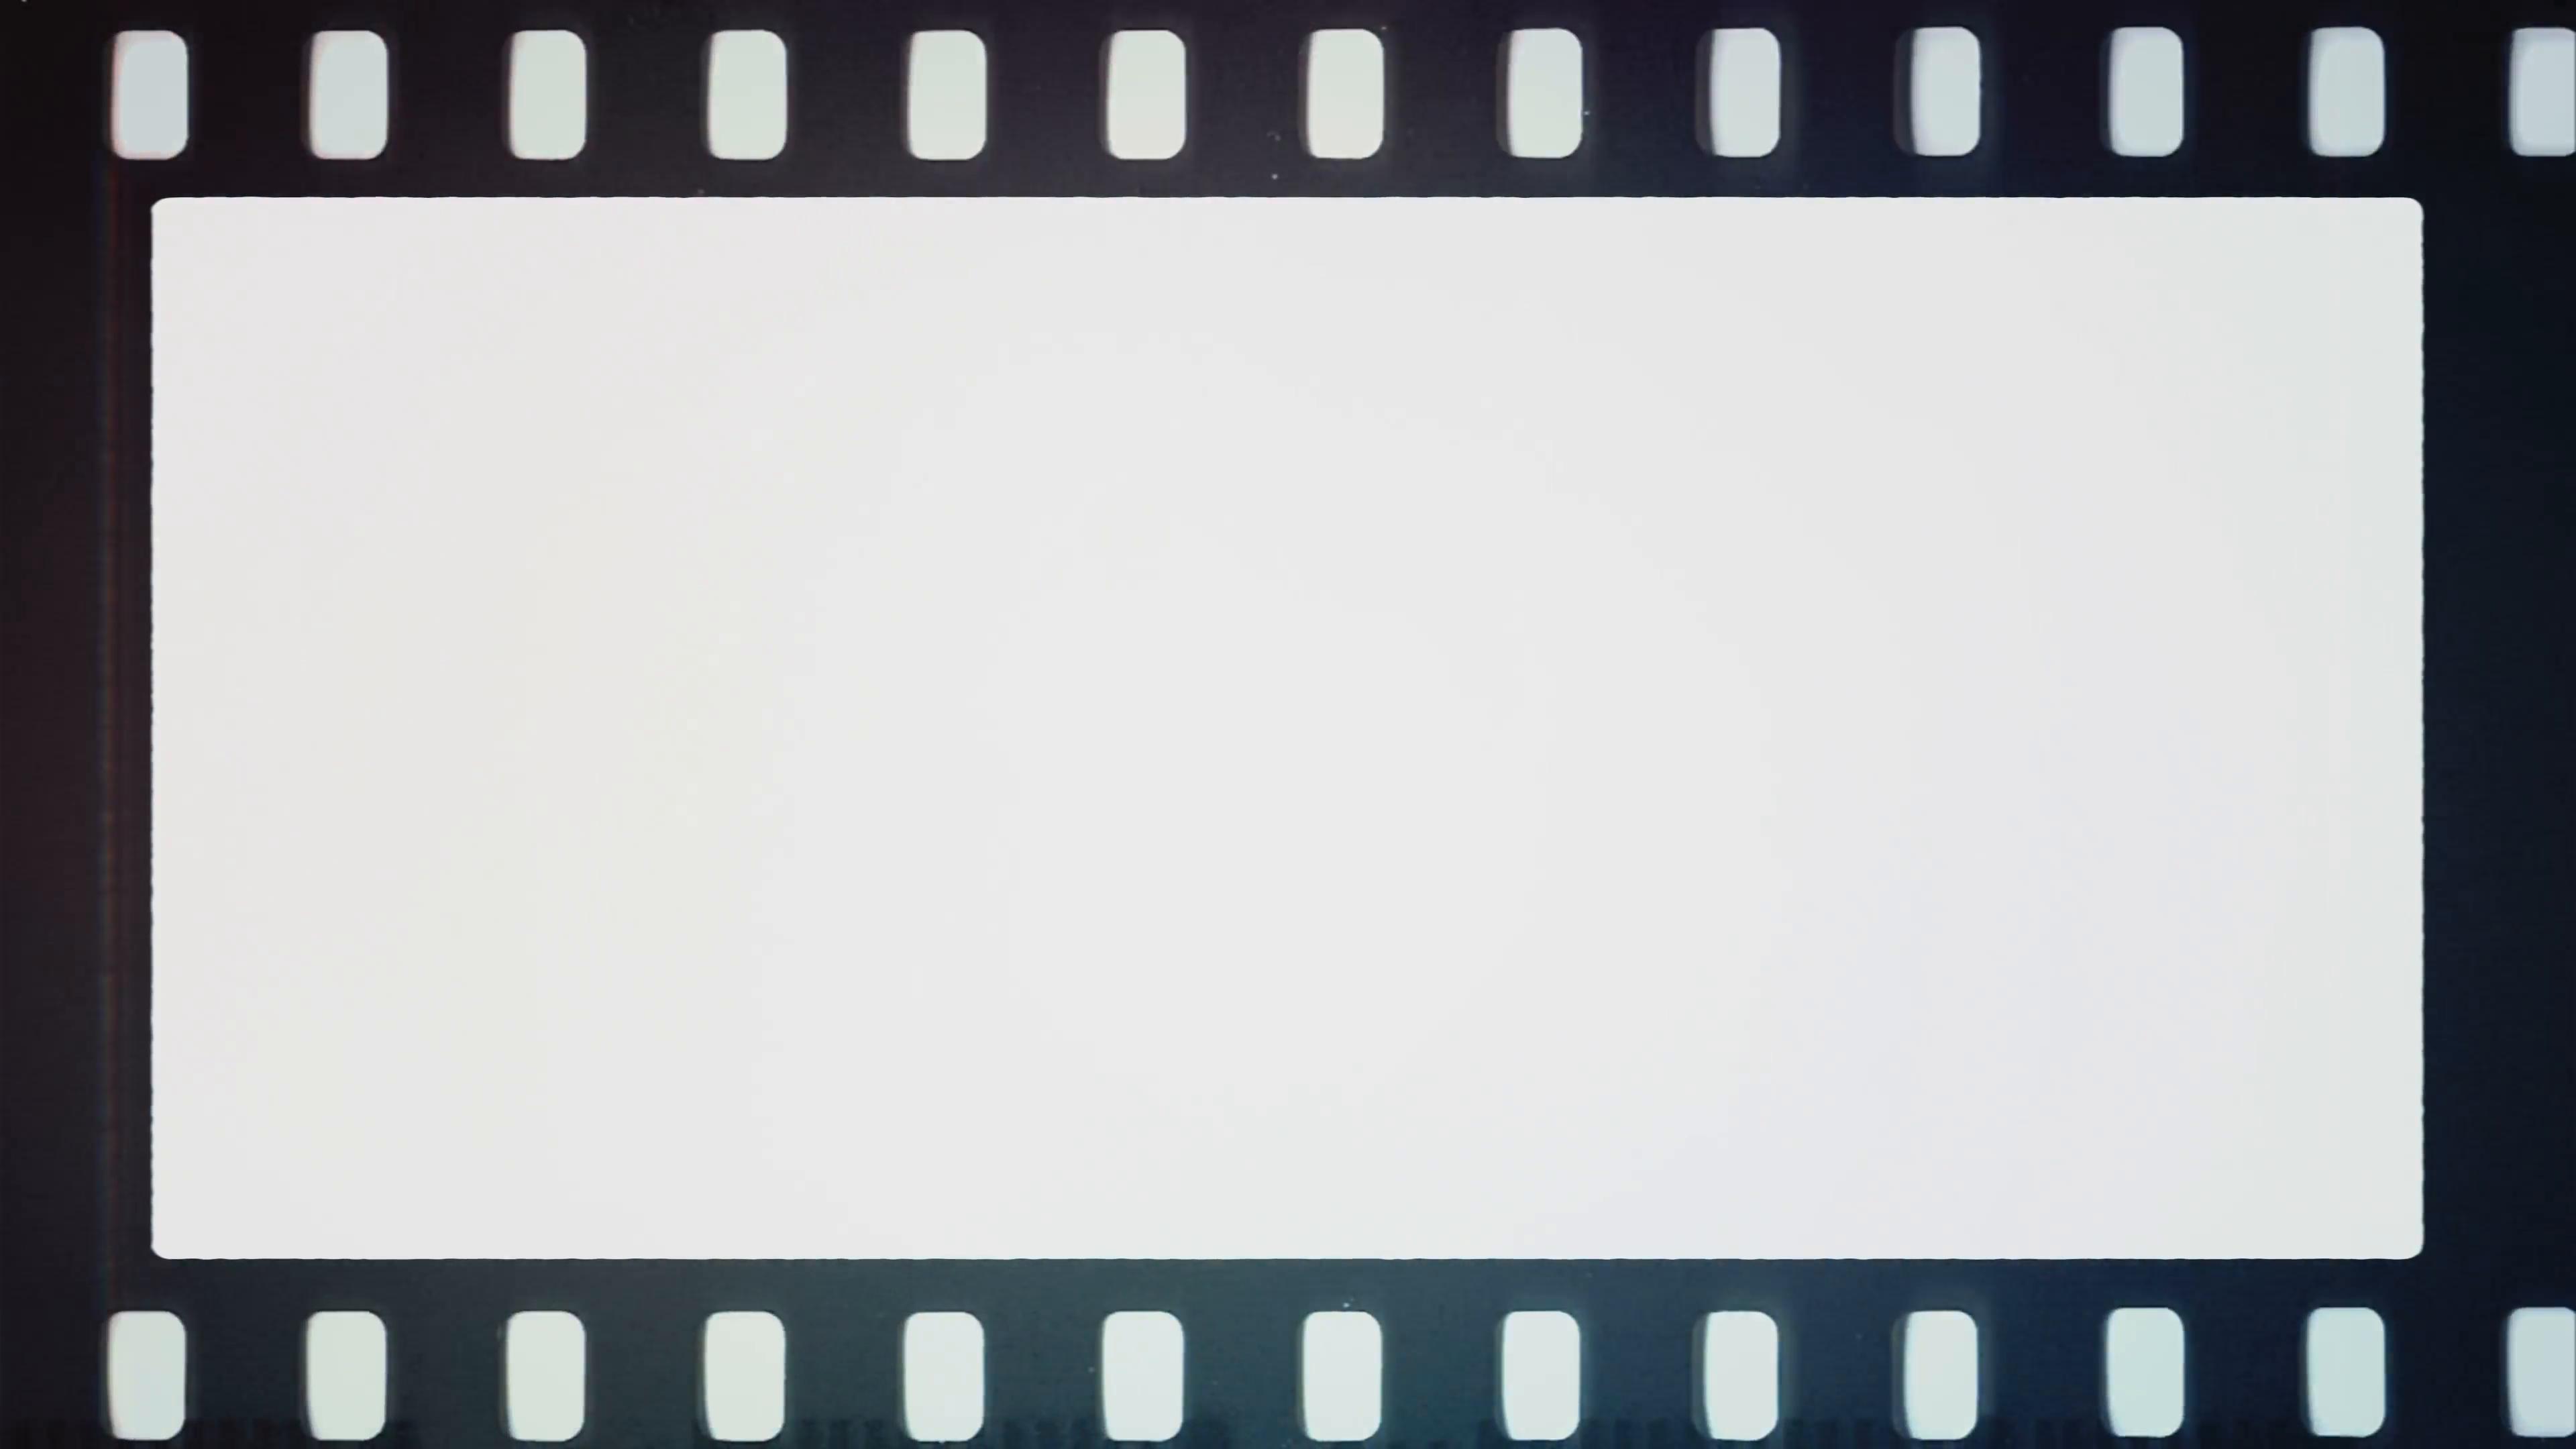 Free photo: Film Strip - Movies, Photo, Strip - Free Download - Jooinn